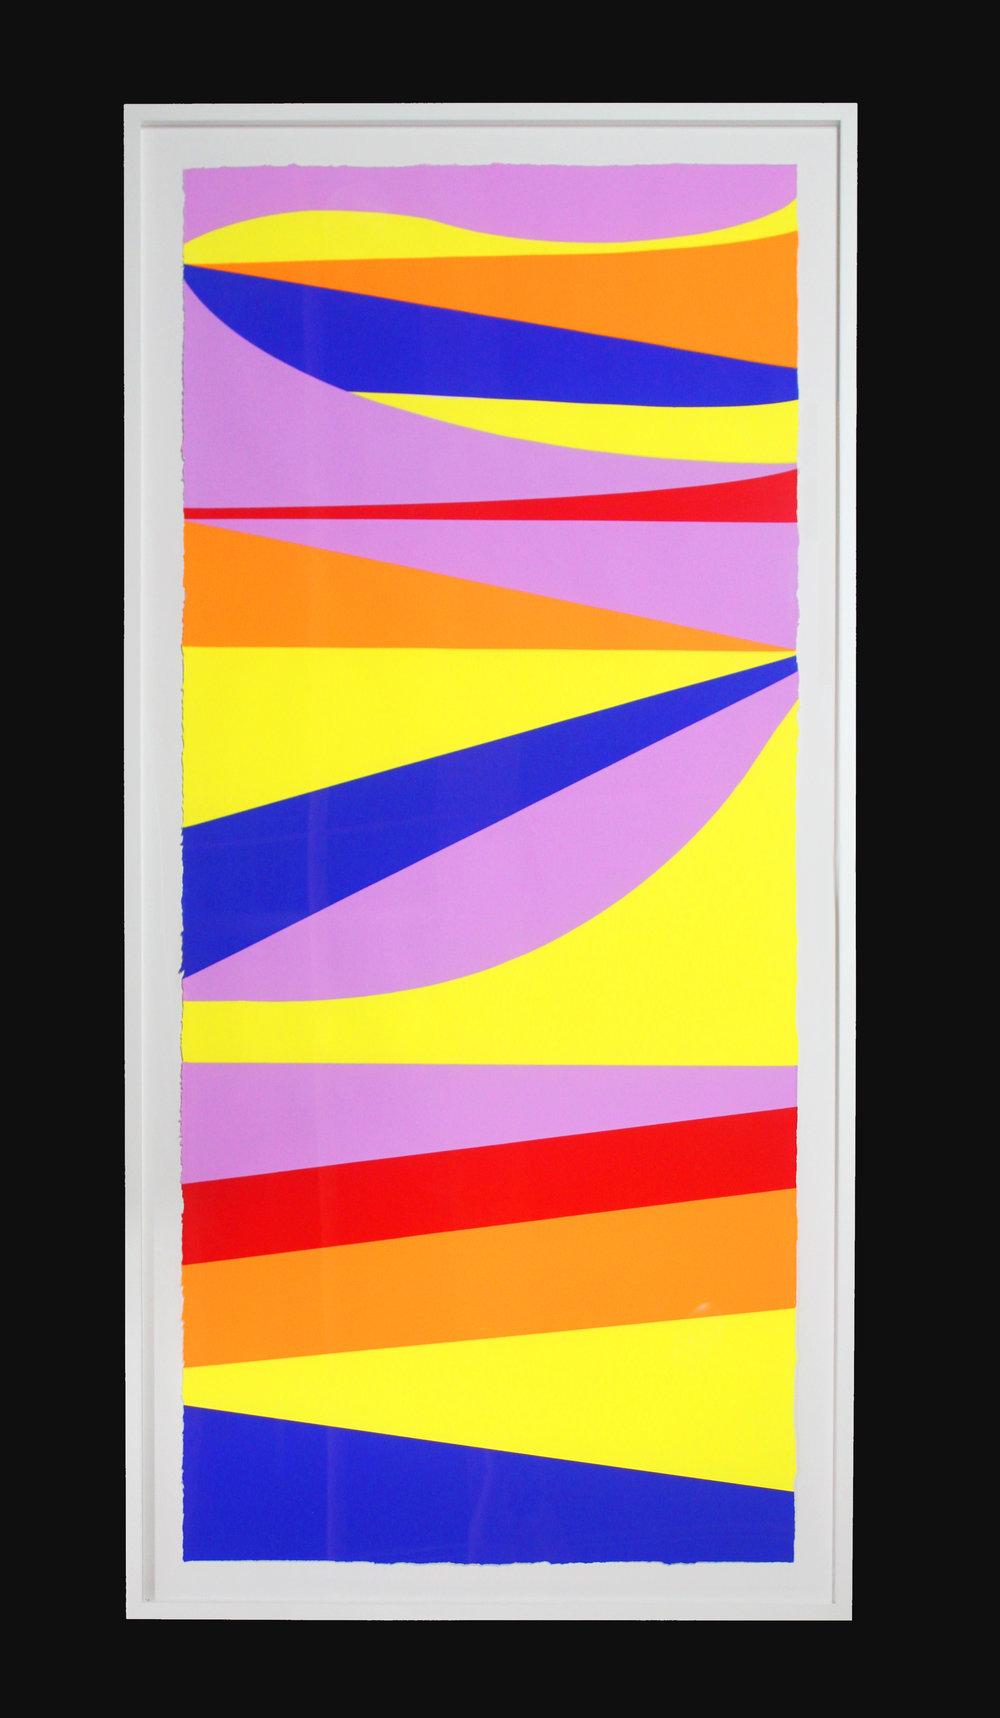 _Let it Slide_ 2.5 x 5.5 ft screenprint on paper 5 color mono print .jpg